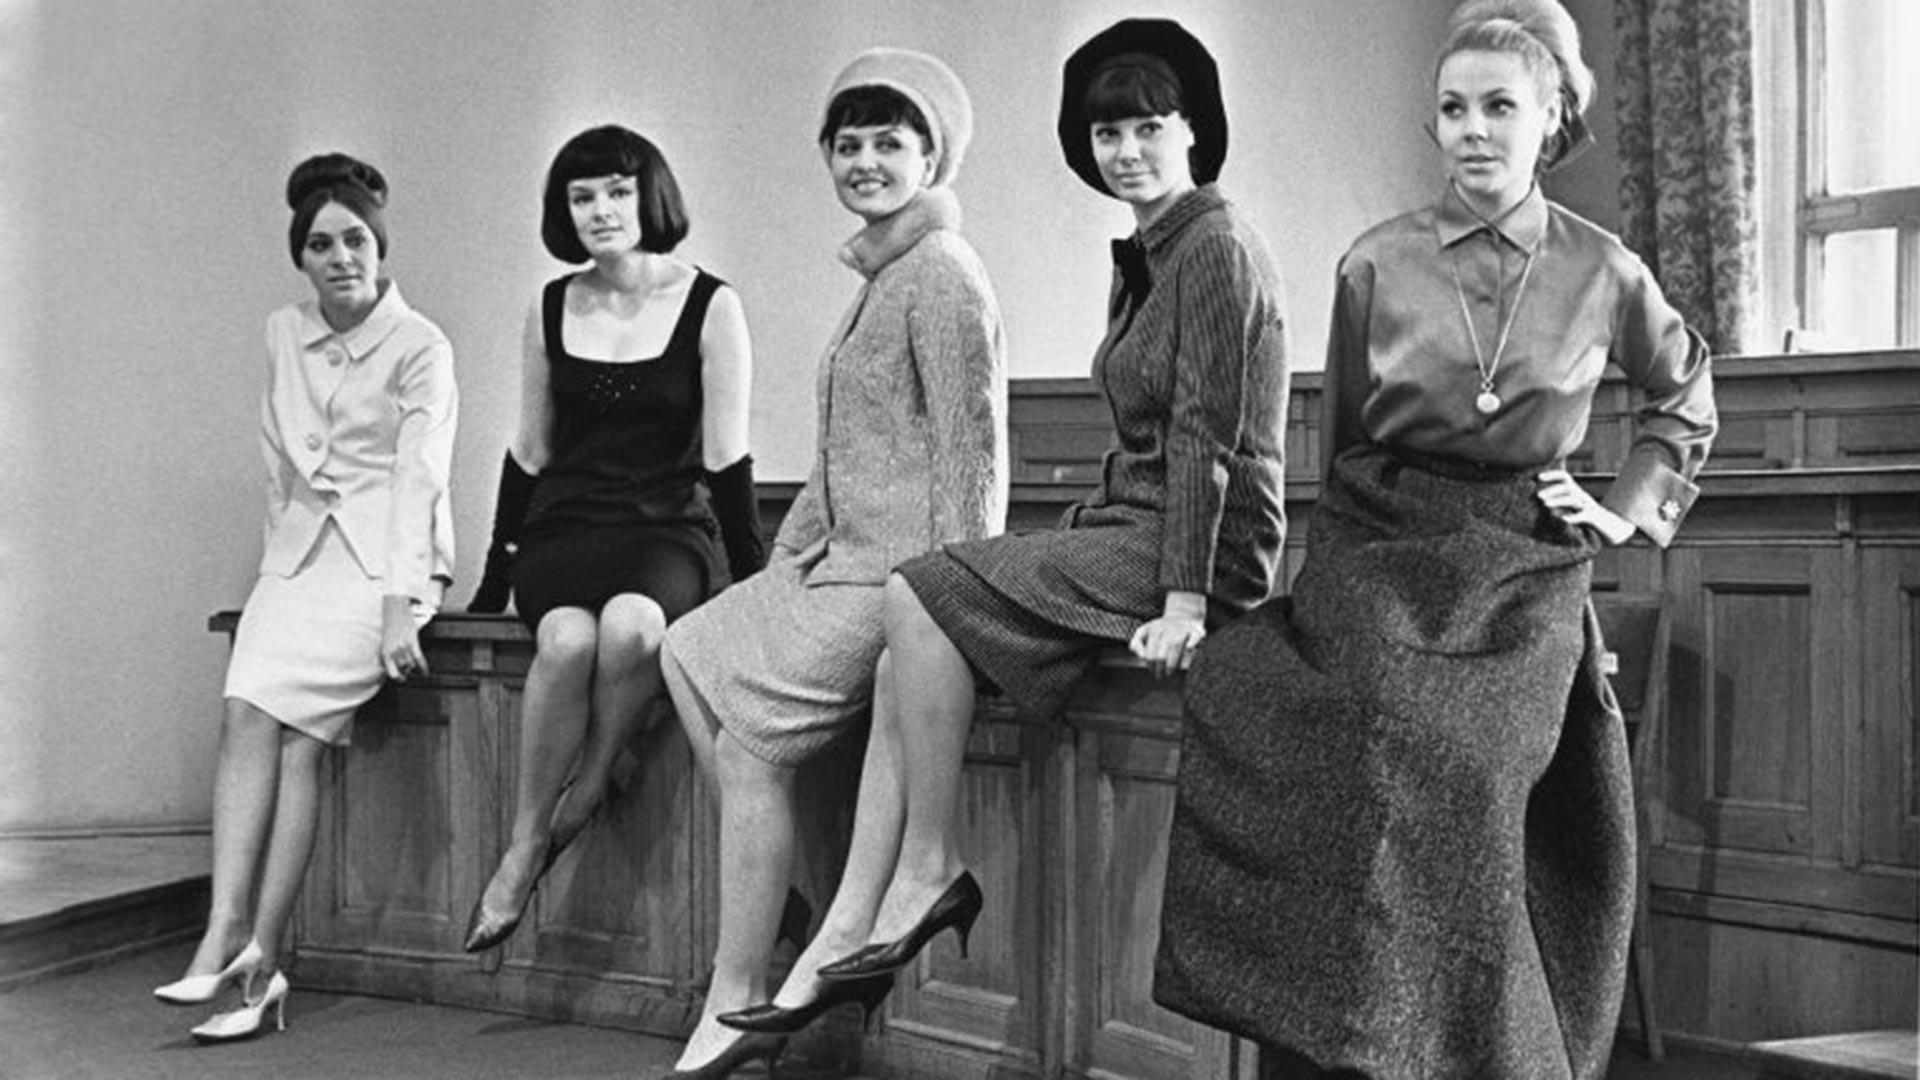 Casa de Moda de Toda a União. Modelos Natalia Kondrashina, Elena Izorgina, Liliana Baskakova, Regina Zbarskaia e Mila Romanovskaia, 1965